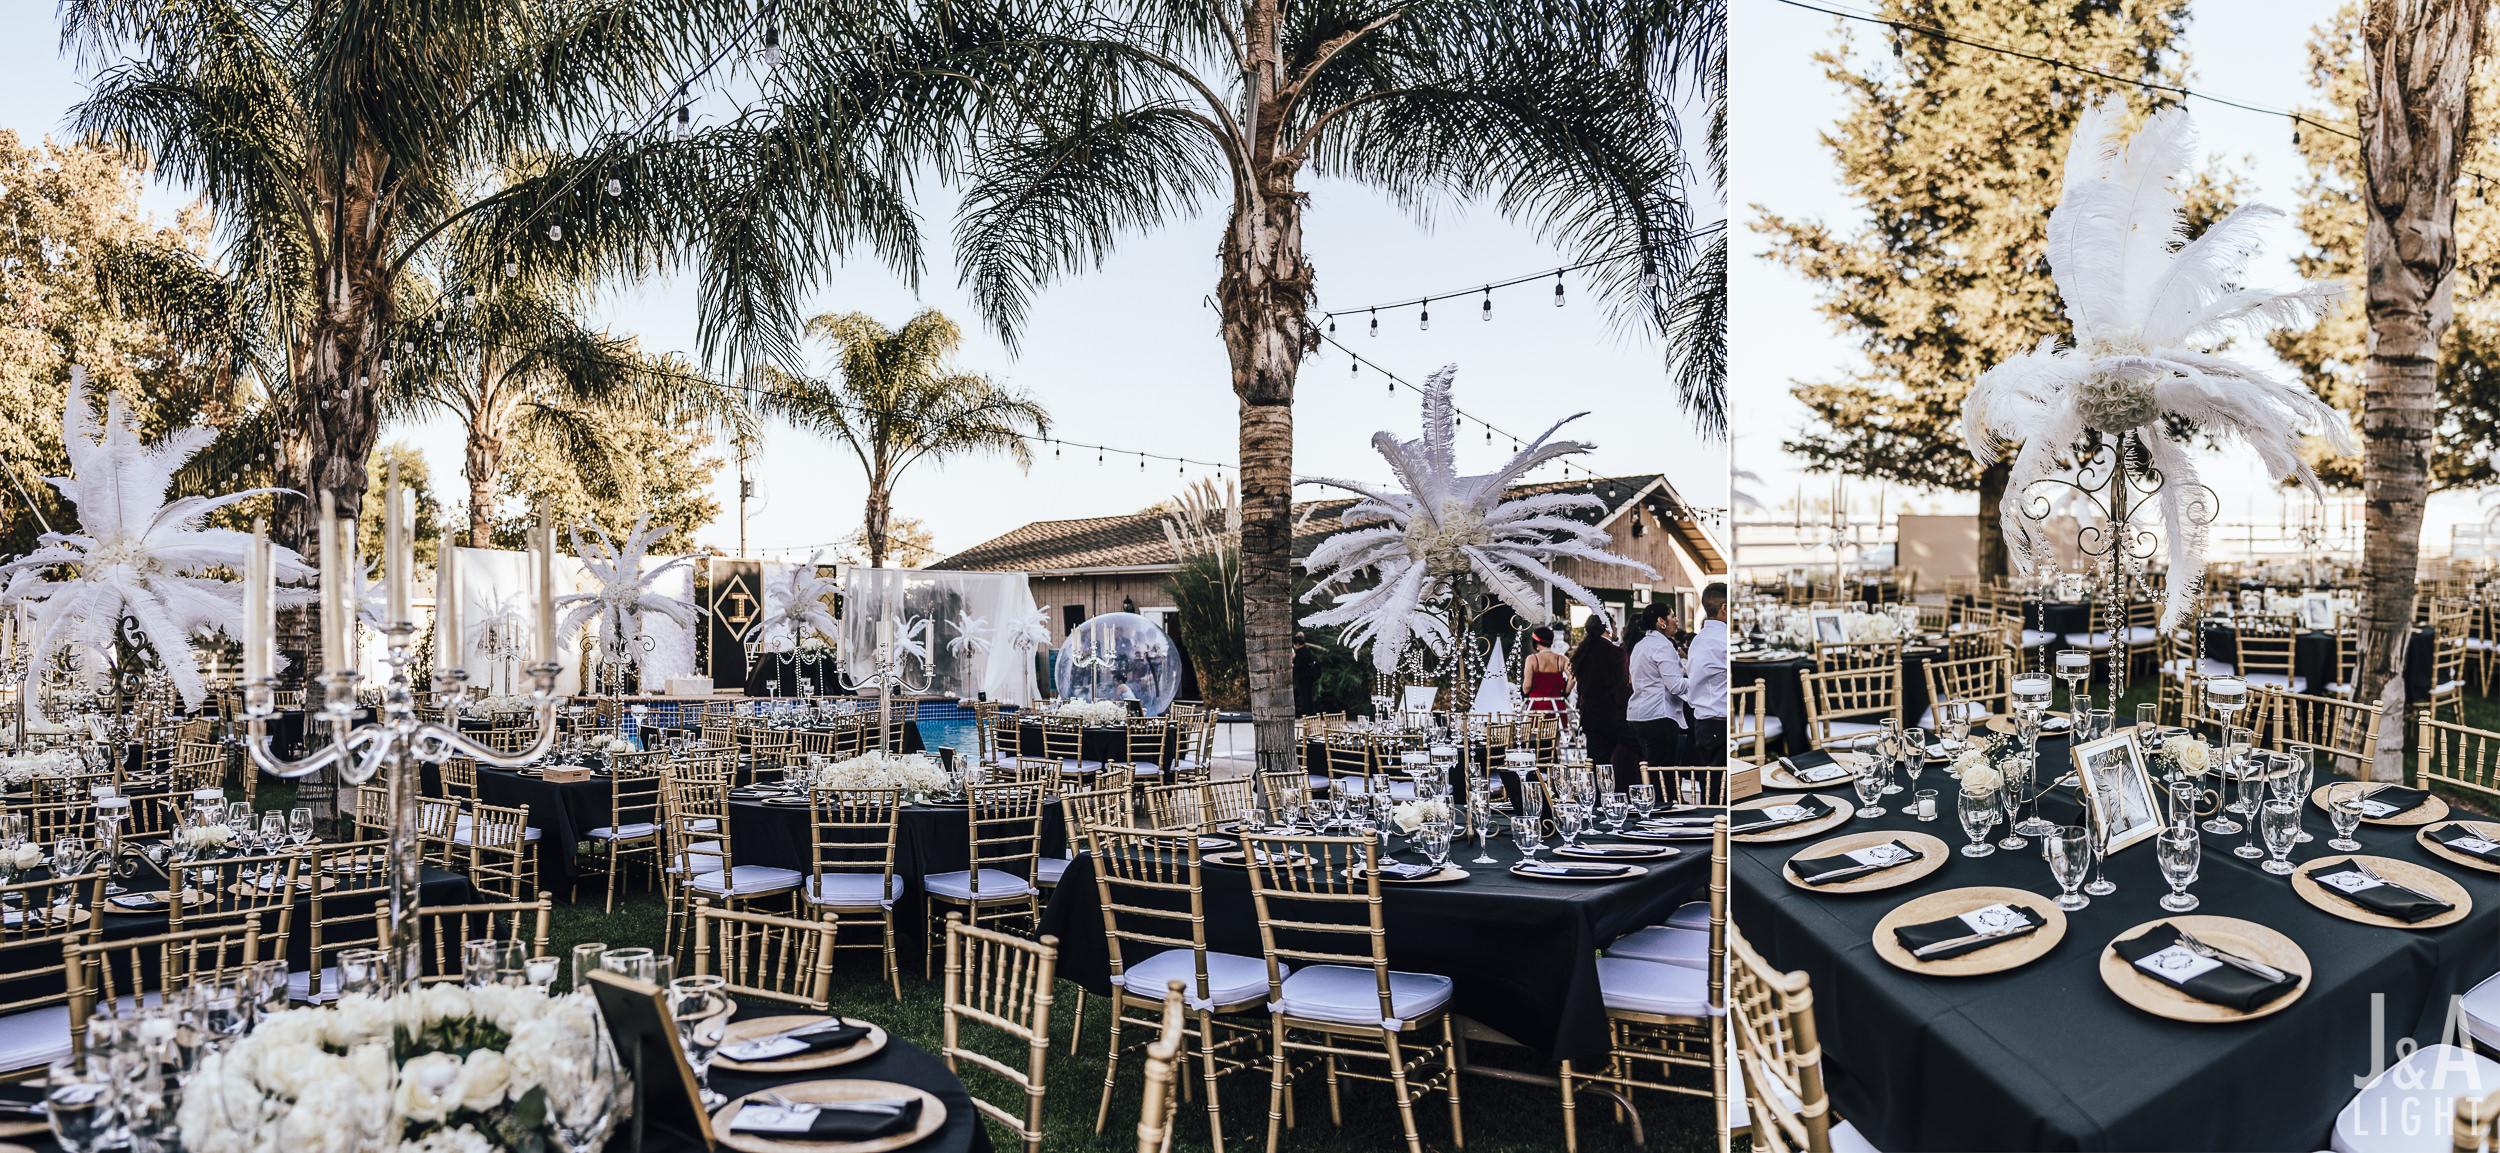 20171014-JanDan-LosBanos-GlassMansion-Wedding-Blog-048.jpg